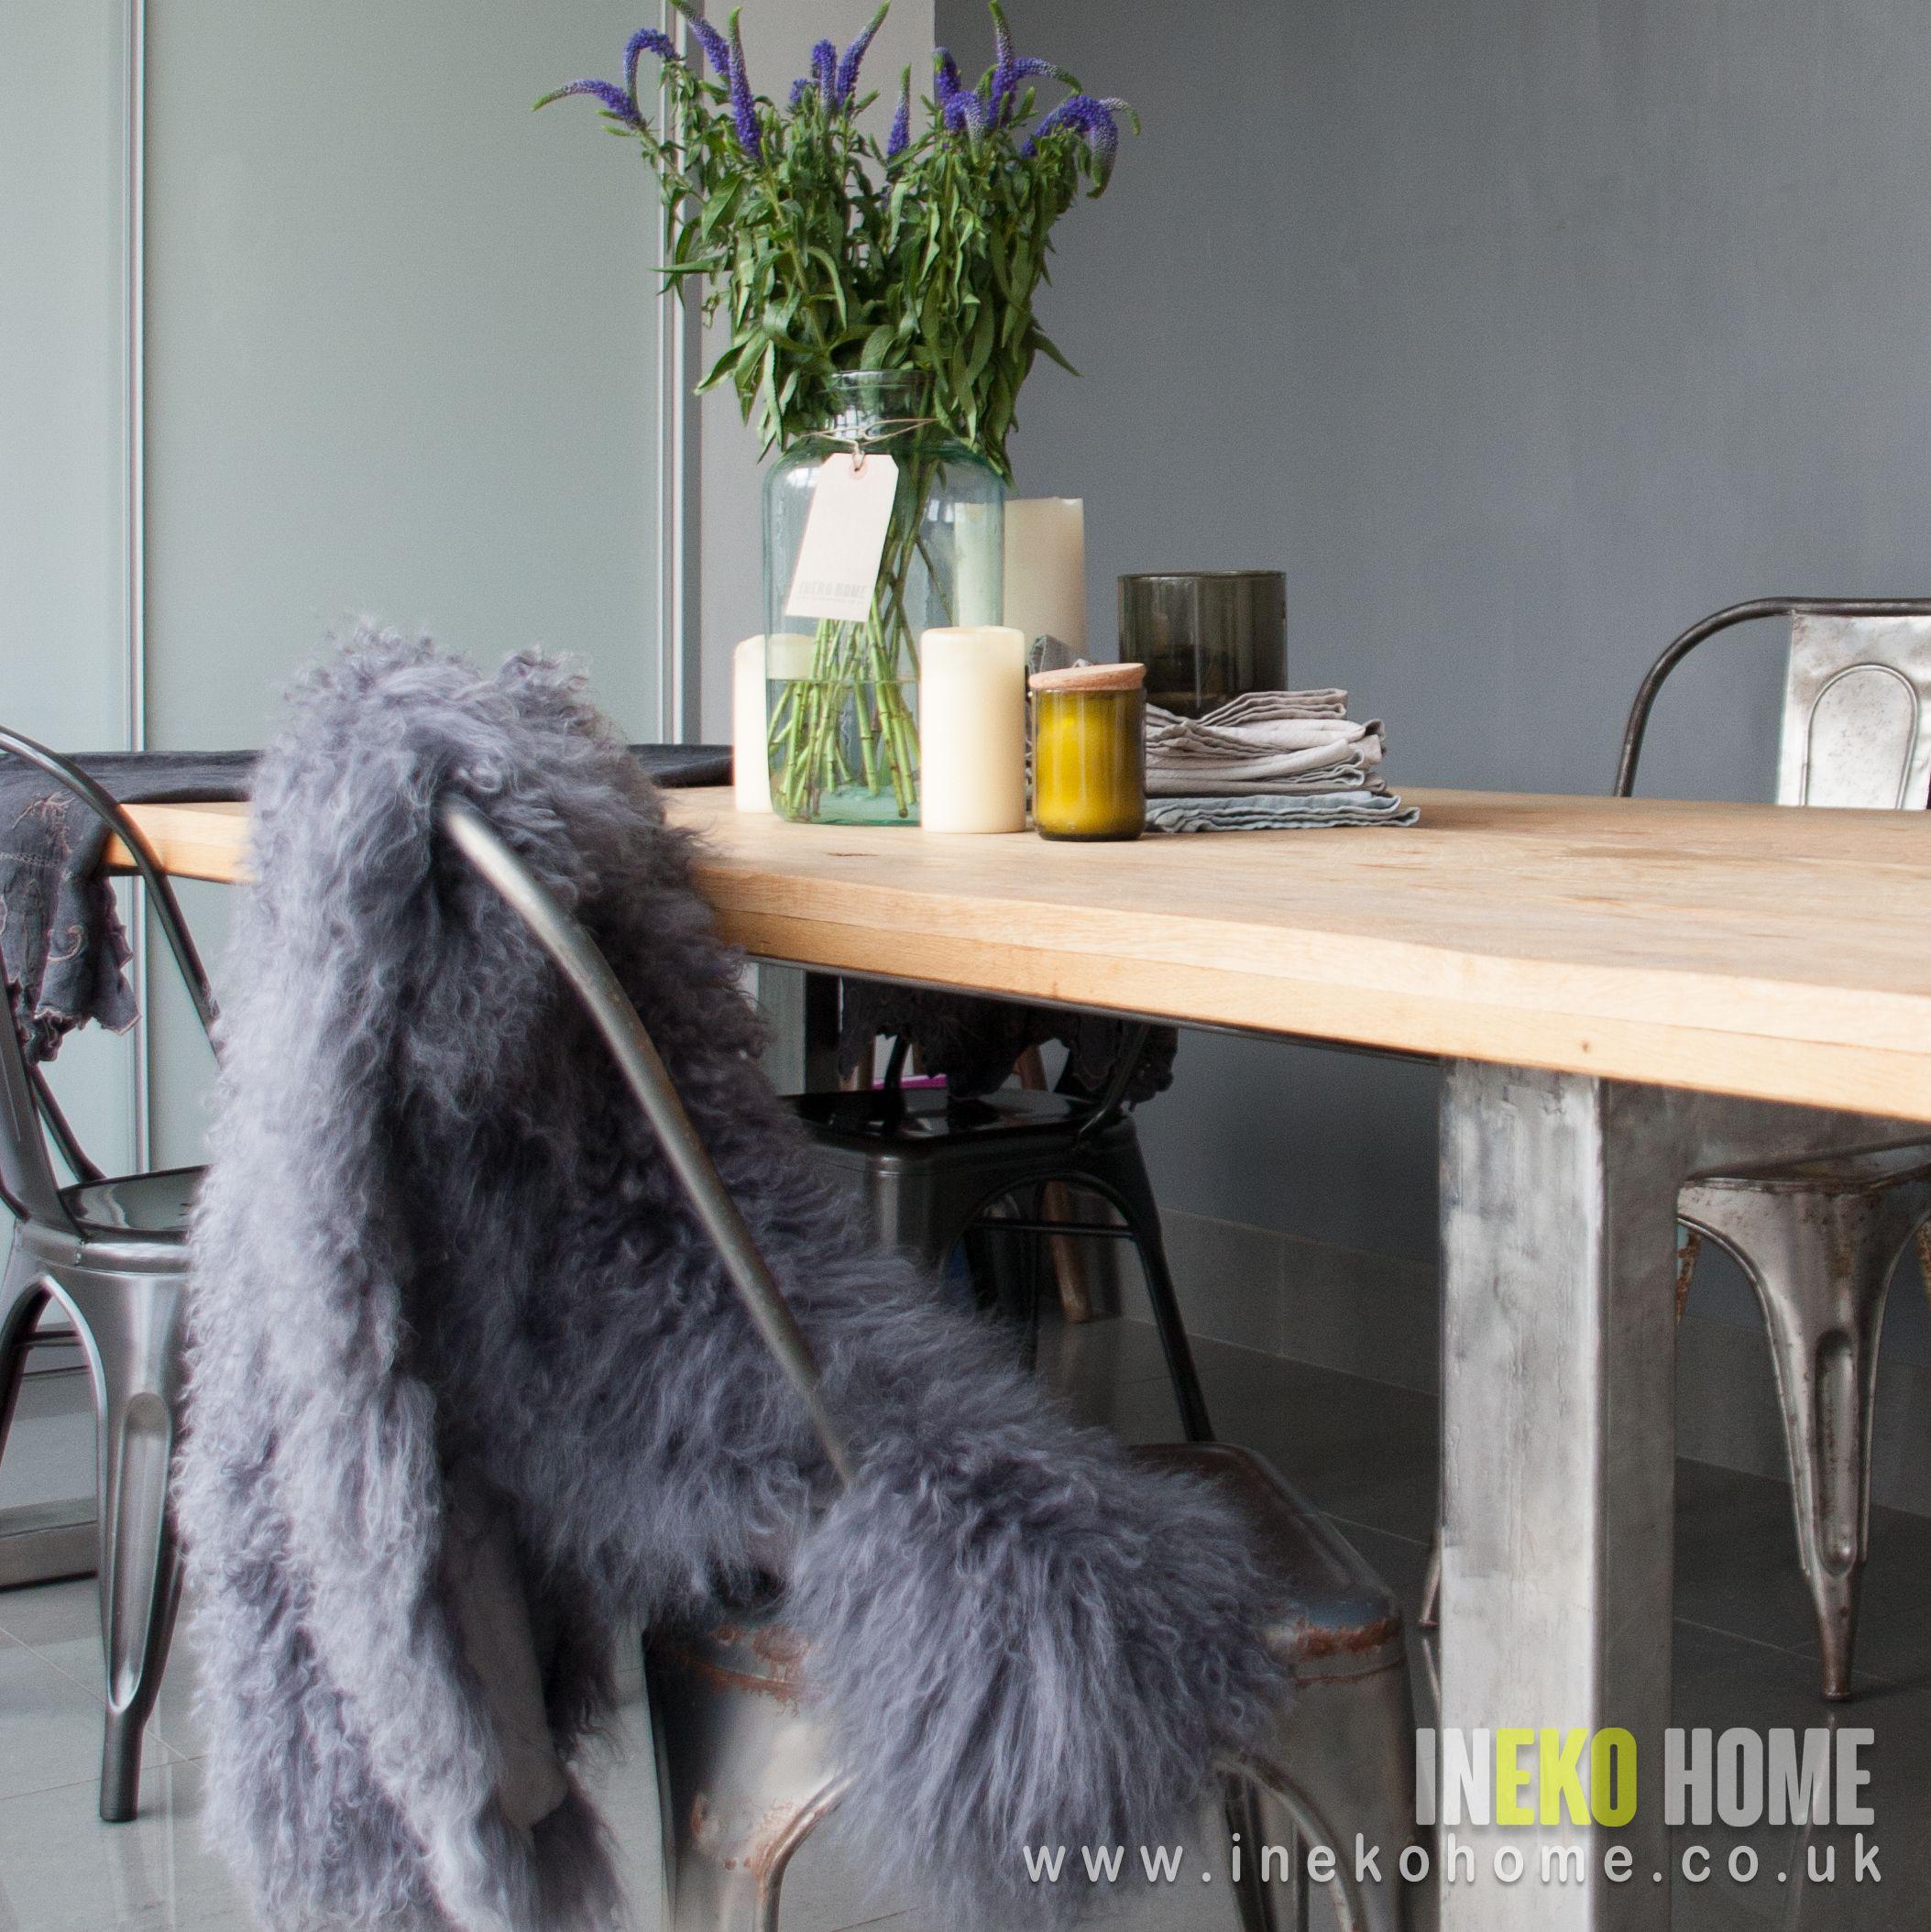 Ineko home is a unique online emporium of eclectic stylish